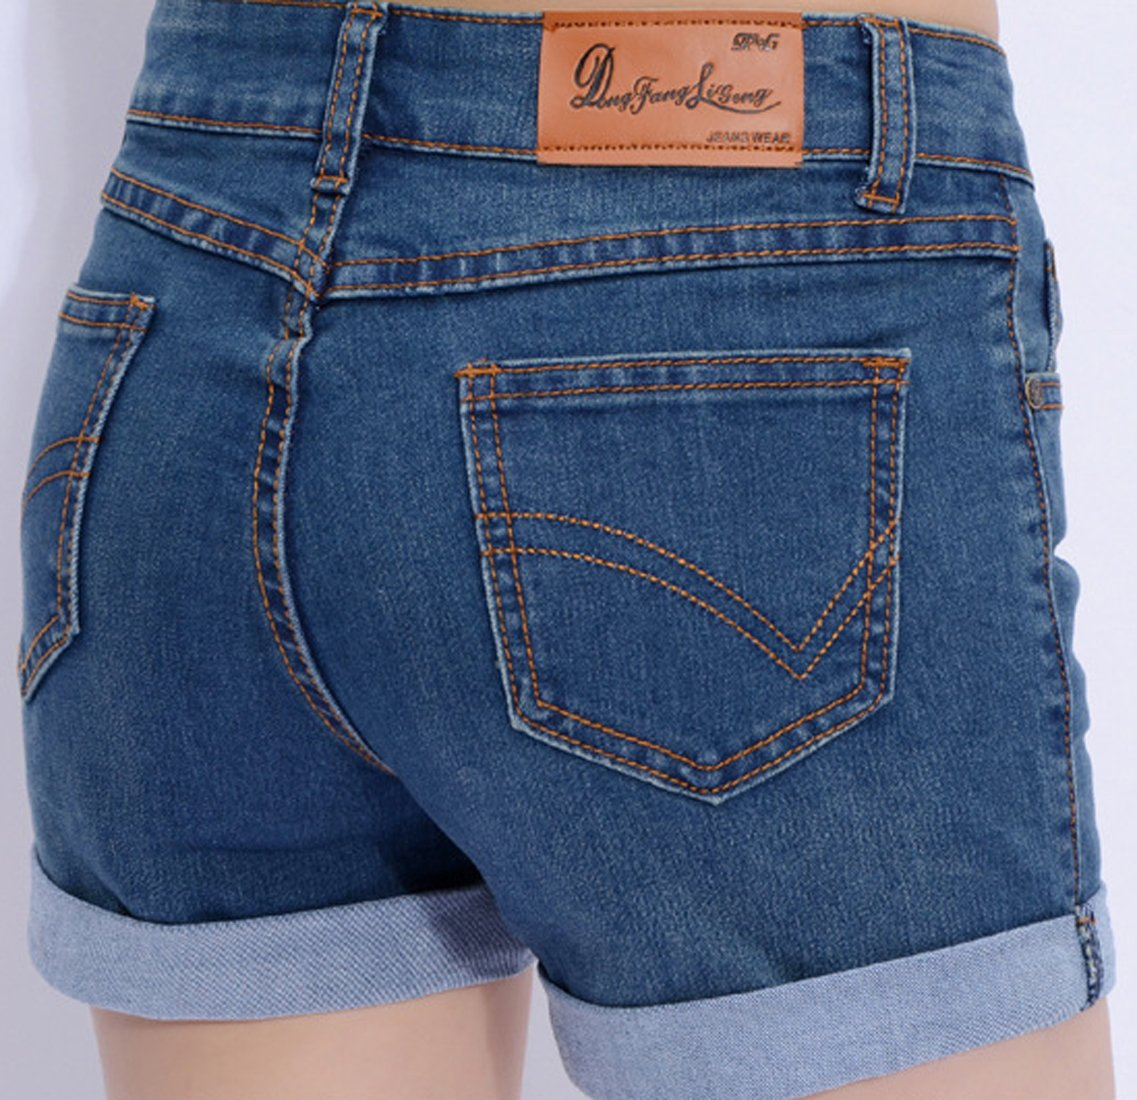 Chouyatou Women's Basic Stretched Mid-Rise Turn-up Cratched Denim Shorts (Large, Blue) by Chouyatou (Image #4)